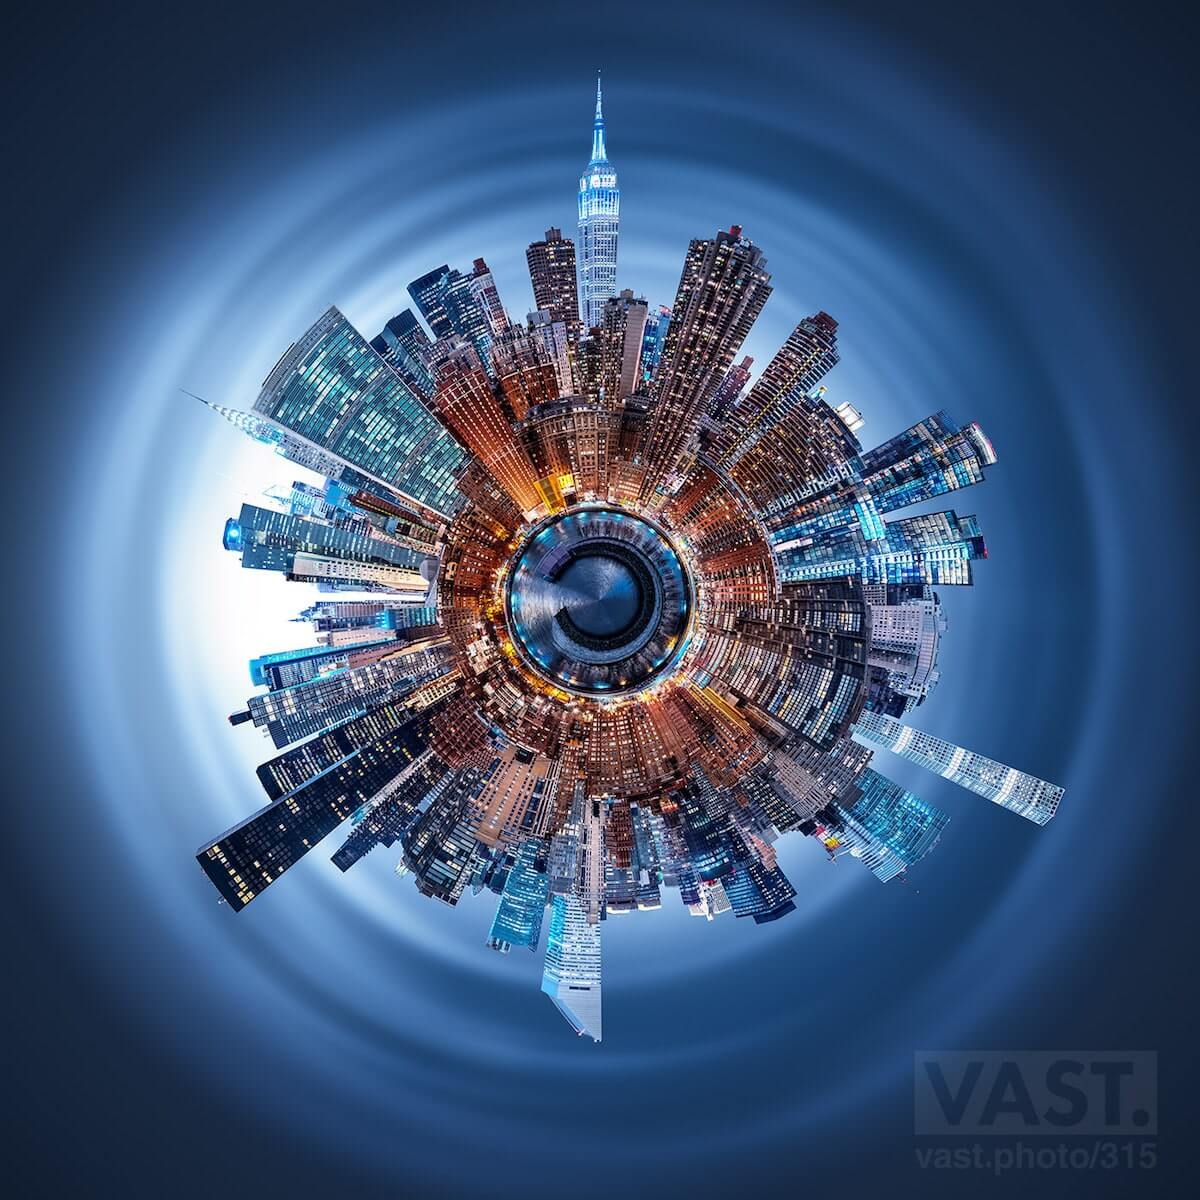 600 мегапиксельная фотография Манхєттена, фото 1